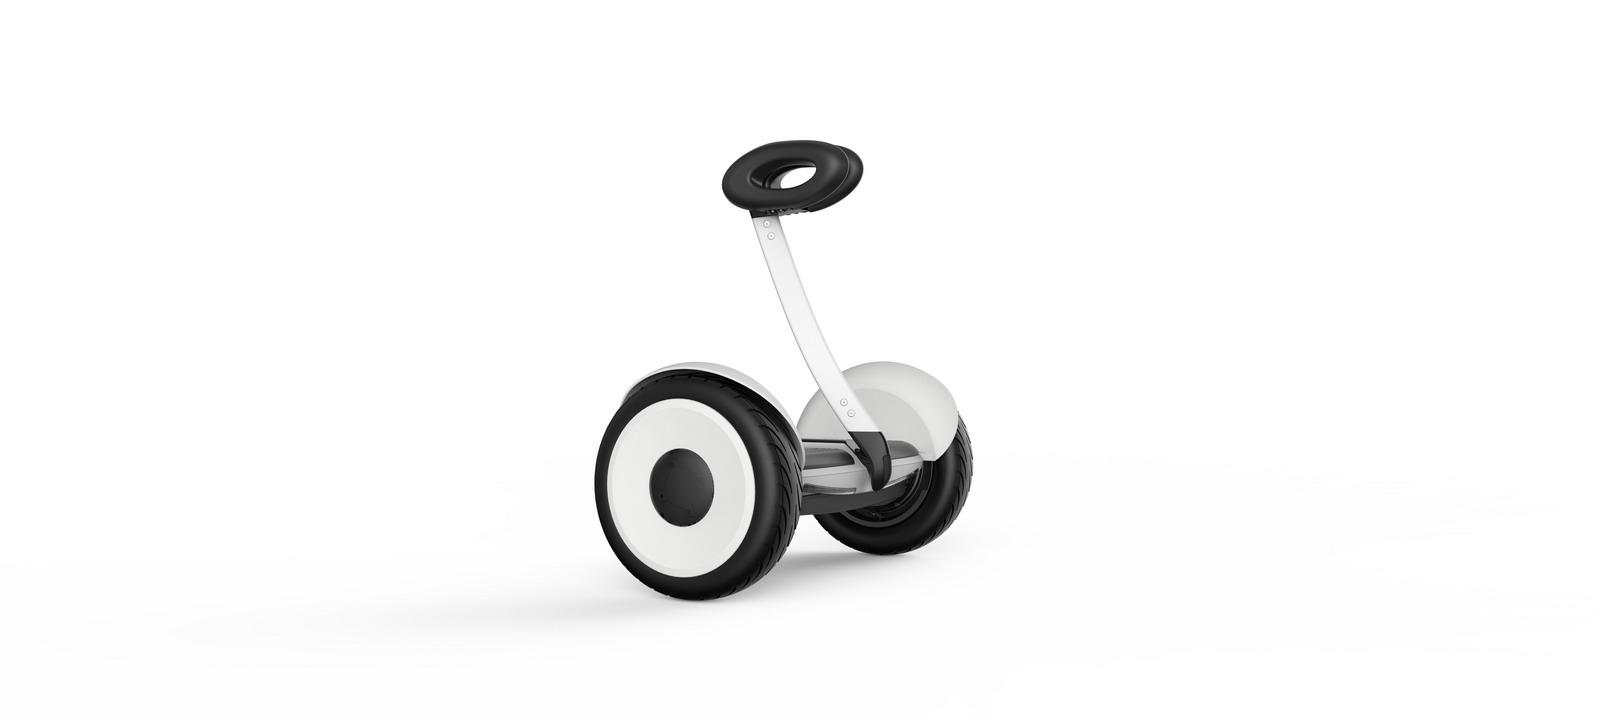 95 - Segway Mini Lite